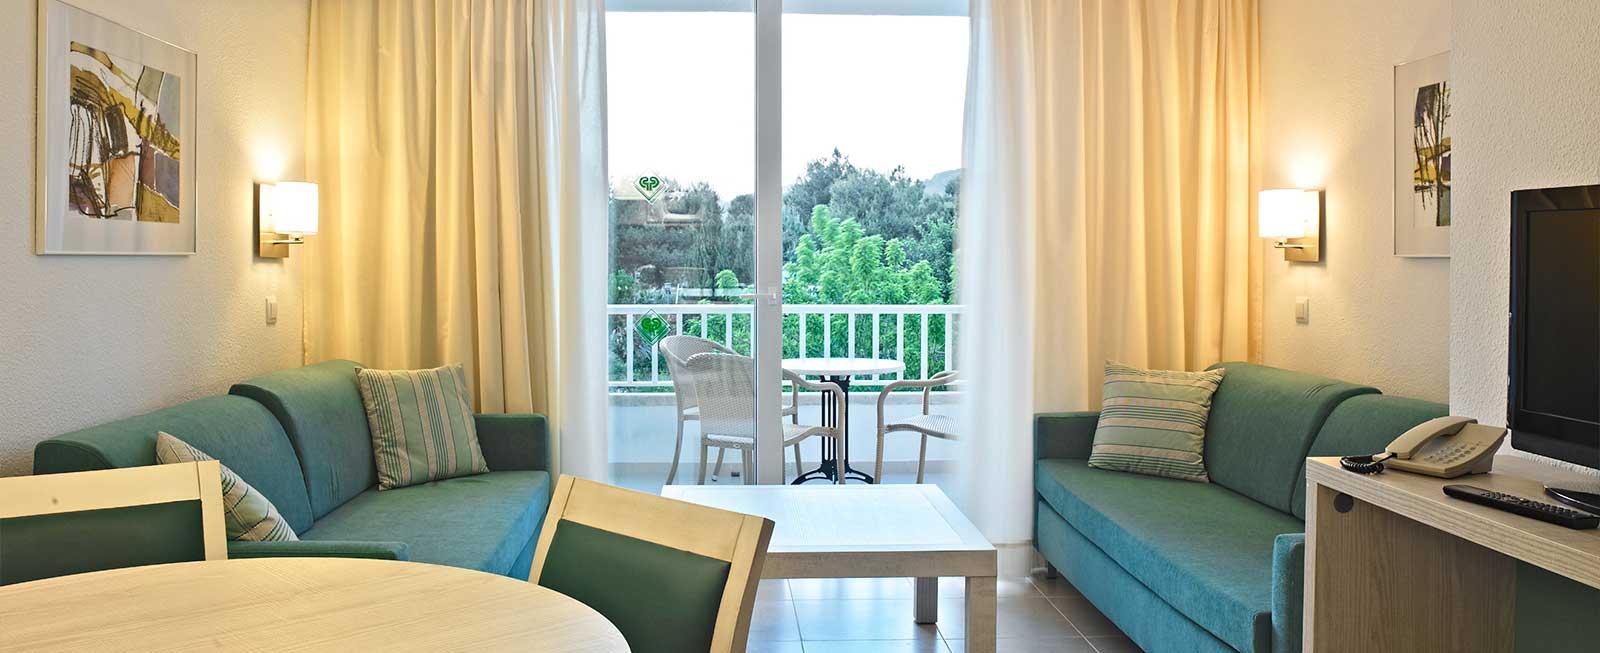 Rooms Amp Apartments Protur Safari Park Aparthotel Sa Coma